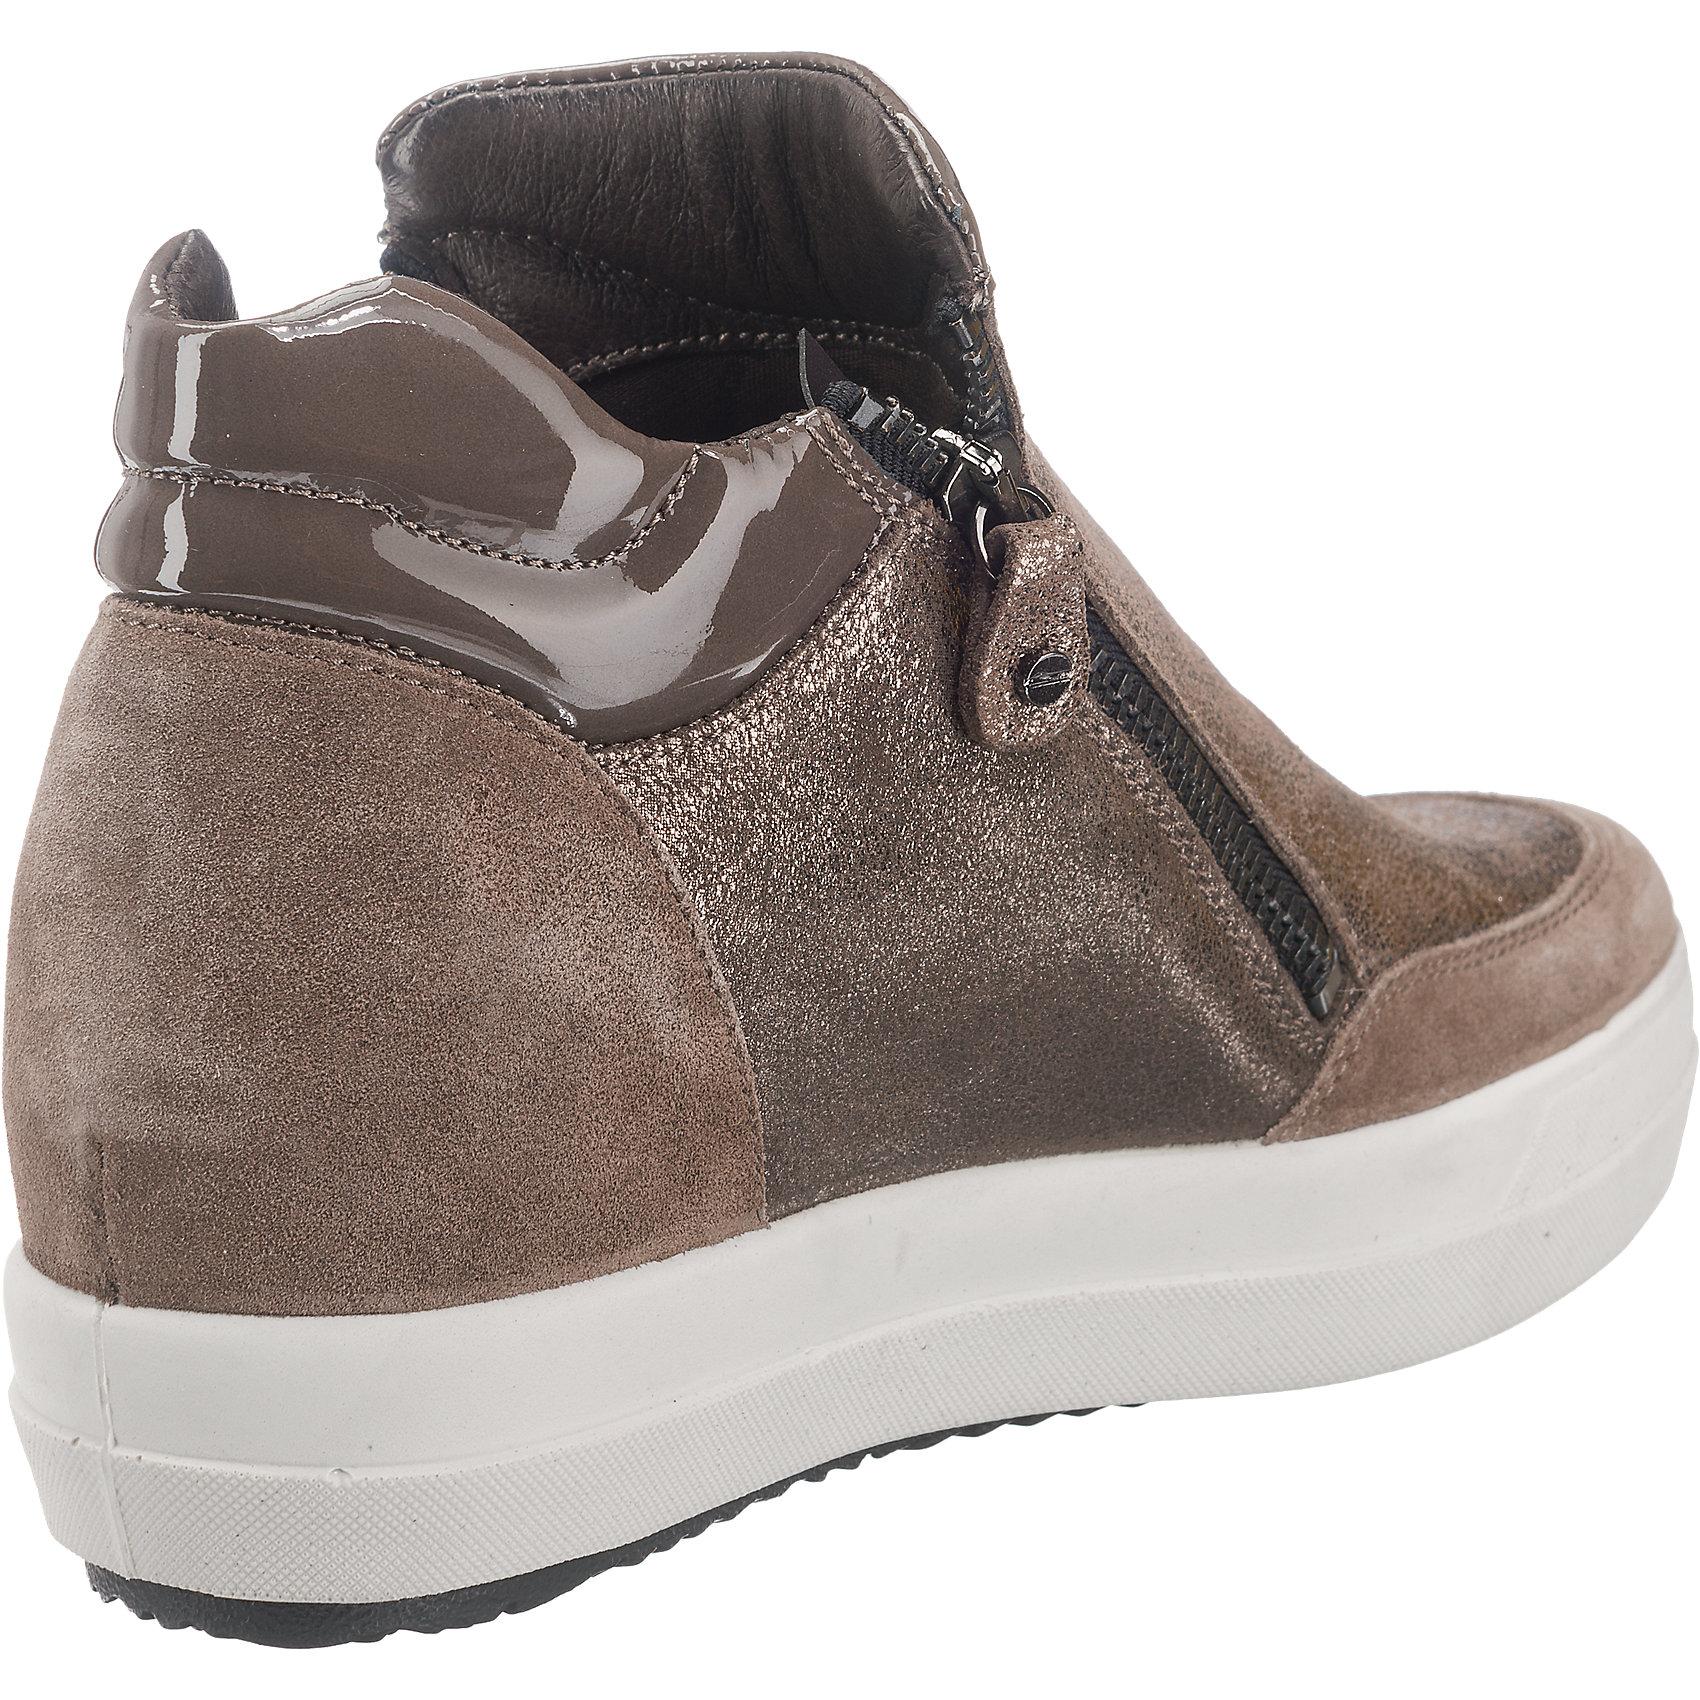 new york 8425c 70747 ... Nike 654857 Mens Stefan Janoski Low Top Skateboarding Shoes Sneakers  Sneakers Sneakers Black 1615dc ...